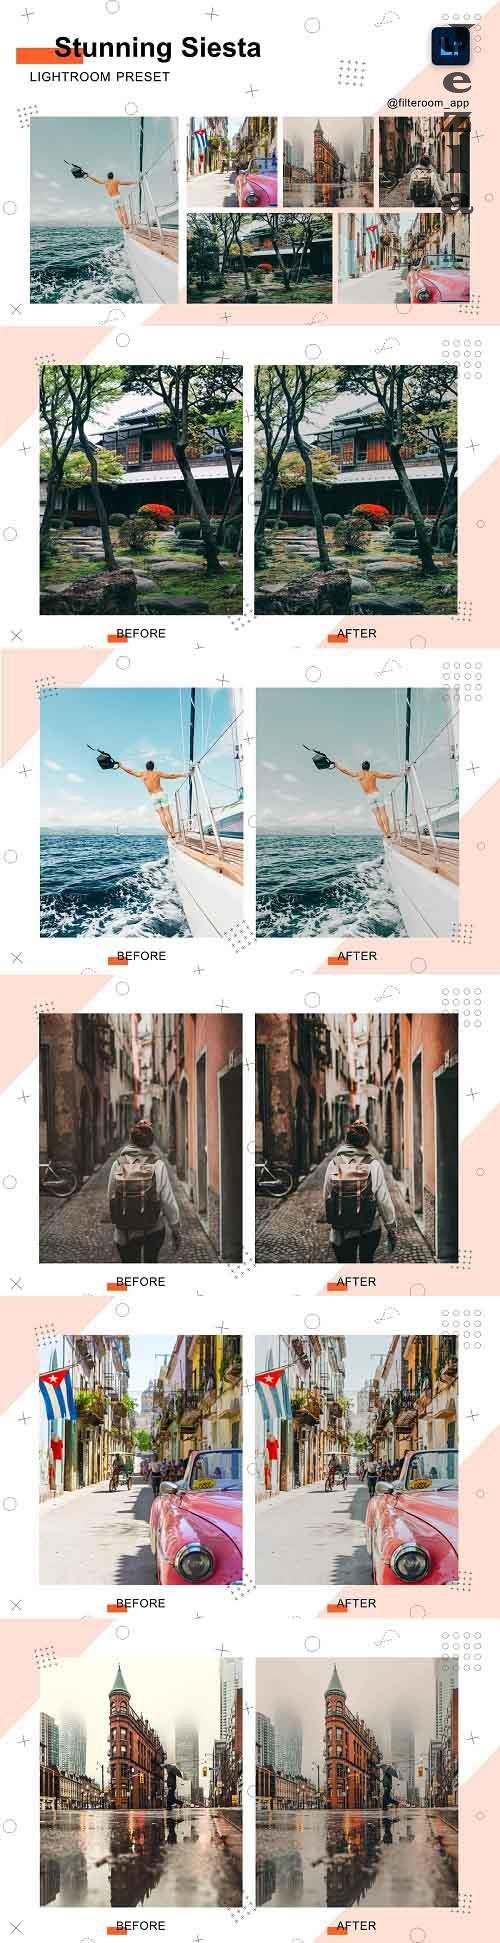 CreativeMarket - Stunning Siesta - Lightroom Presets 5238798